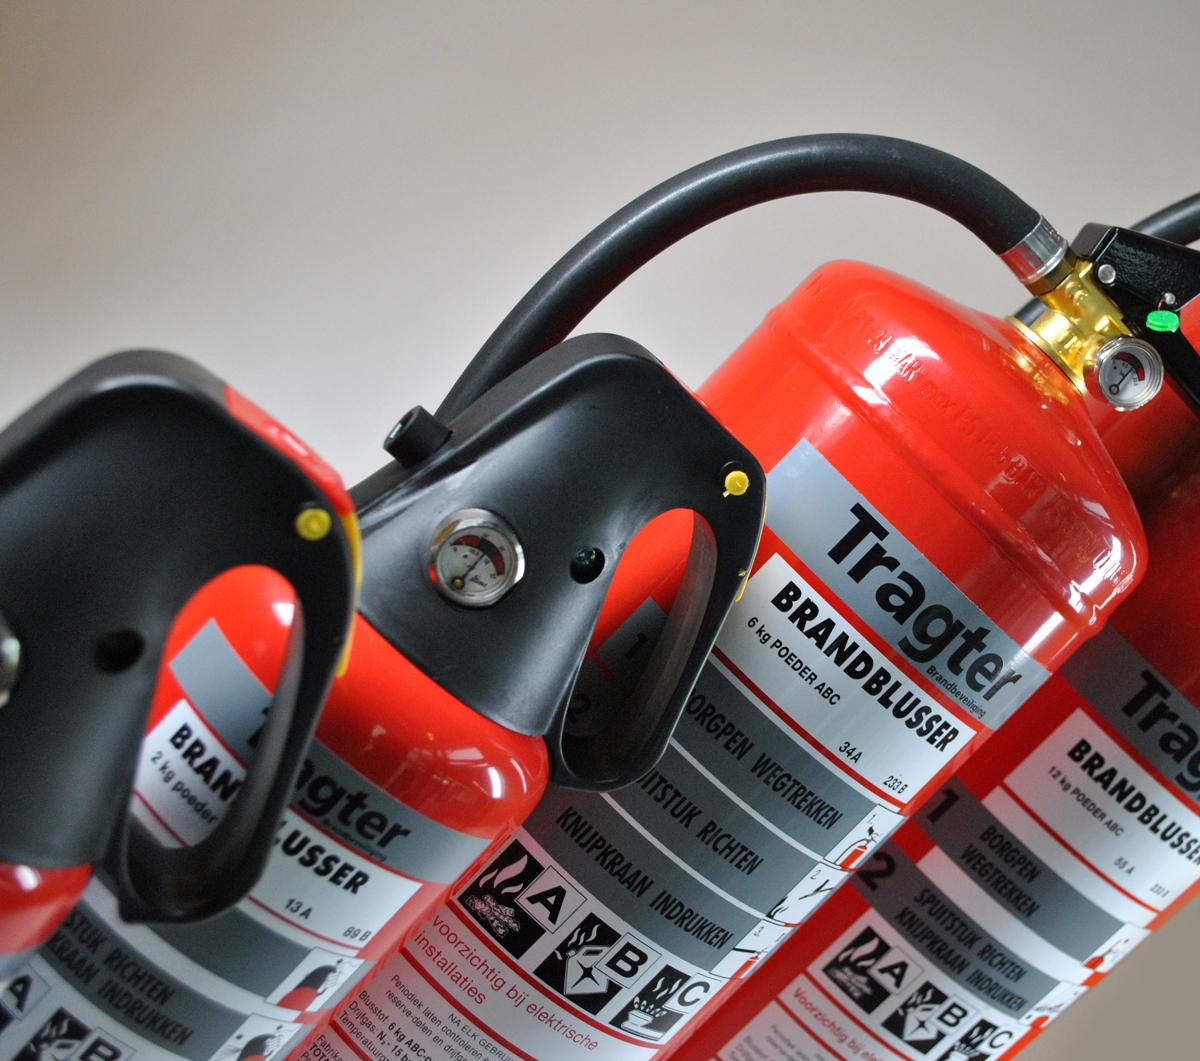 Tragter brandbeveiliging – Productfotografie